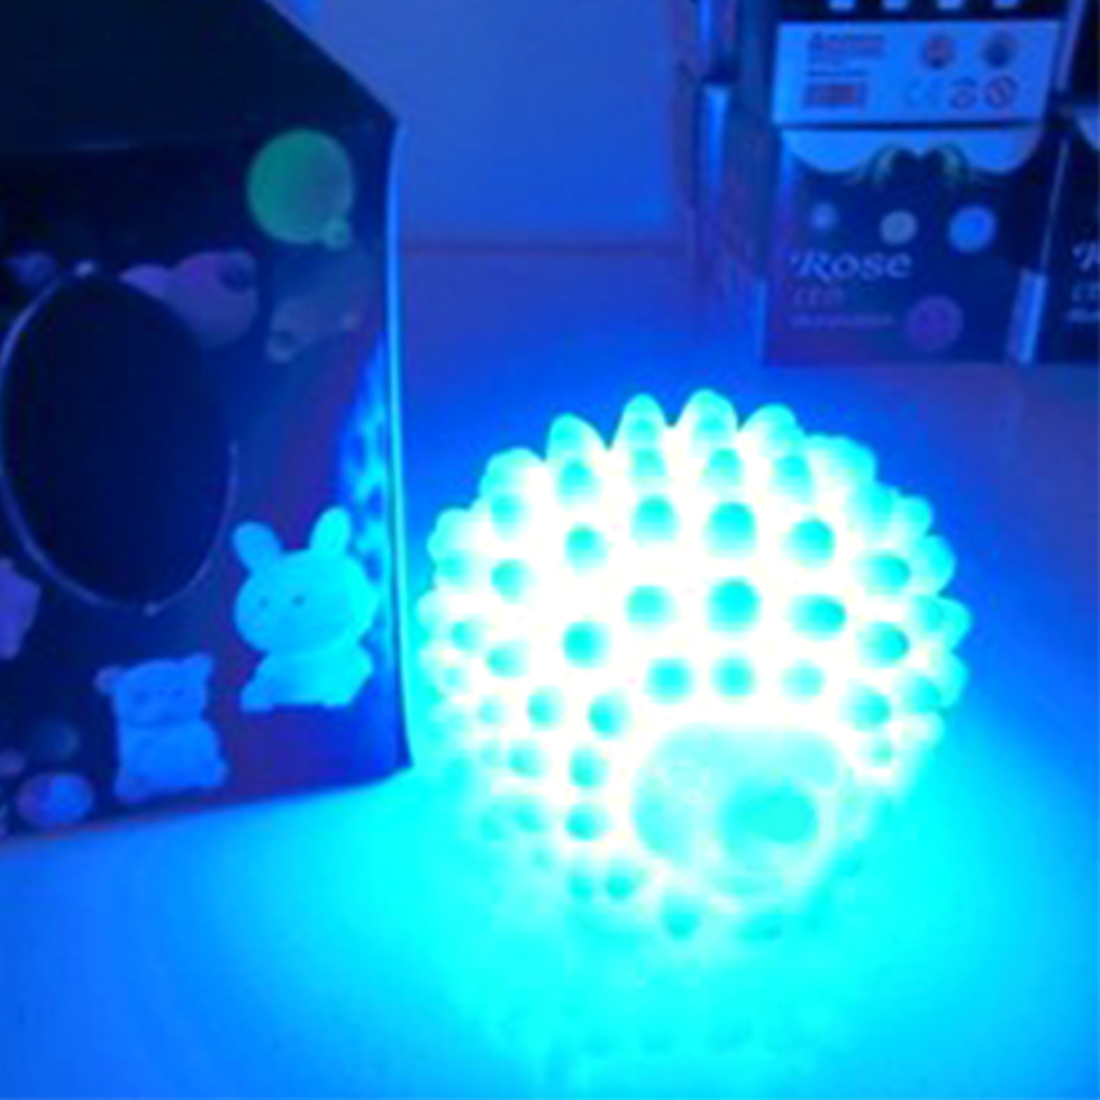 LED Hedgehog Night Light Household Decoration Lamp Desk Lamps Changing Color Christmas Present Baby Light Home Bedside Lamp